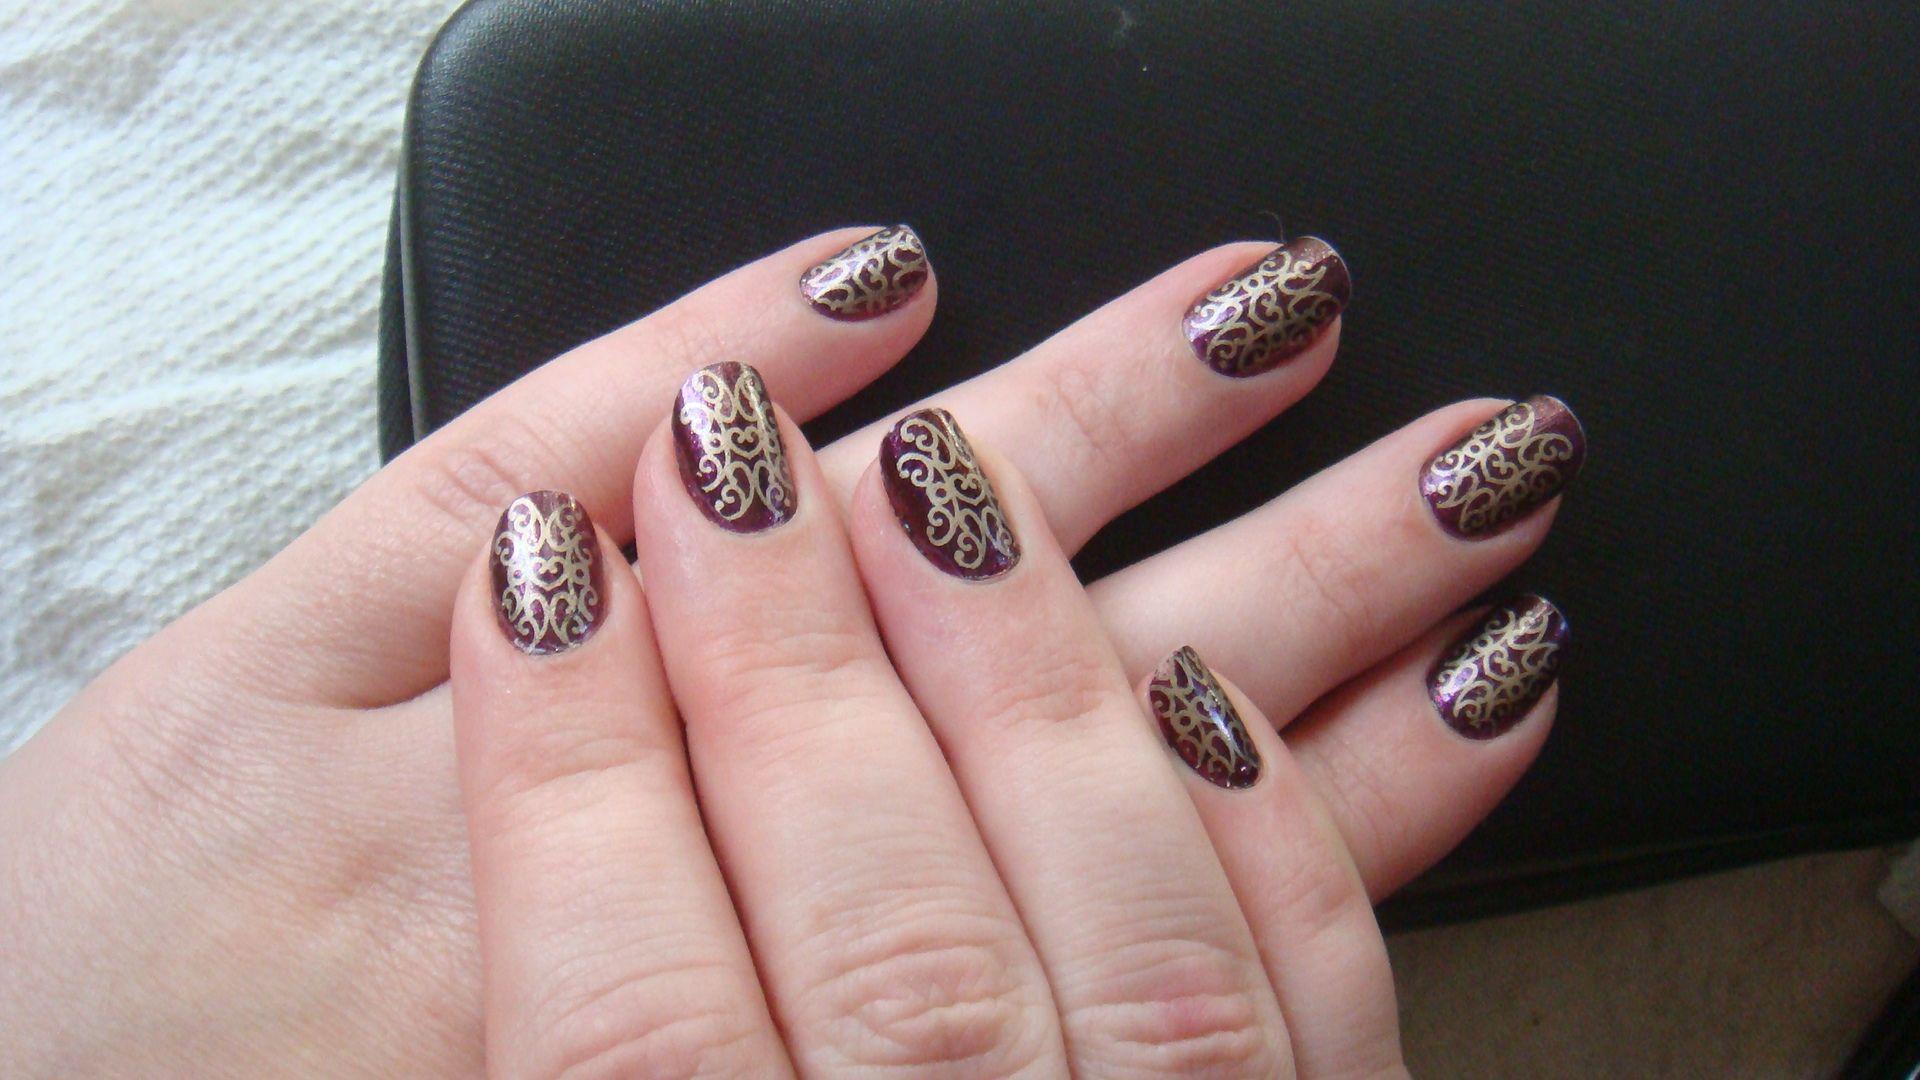 Make It Yourself, Princess- stamped manicure